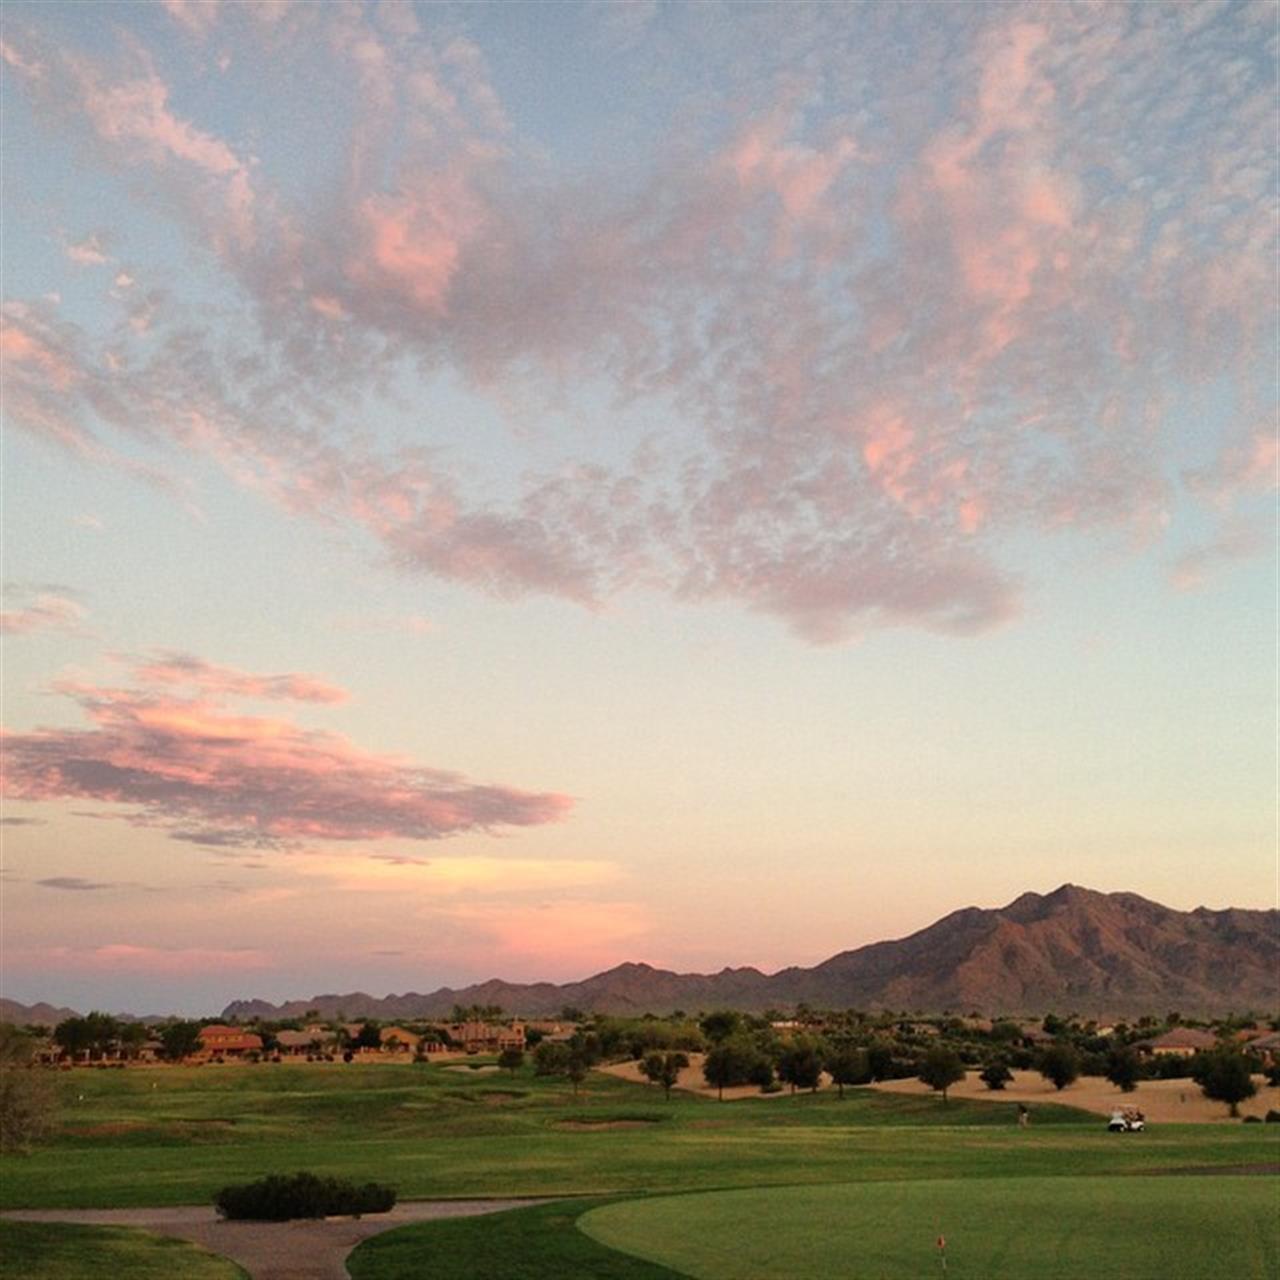 San Tan Mountain at sunset, Gilbert, AZ #LeadingRELocal #Sevillegolfandcountryclub